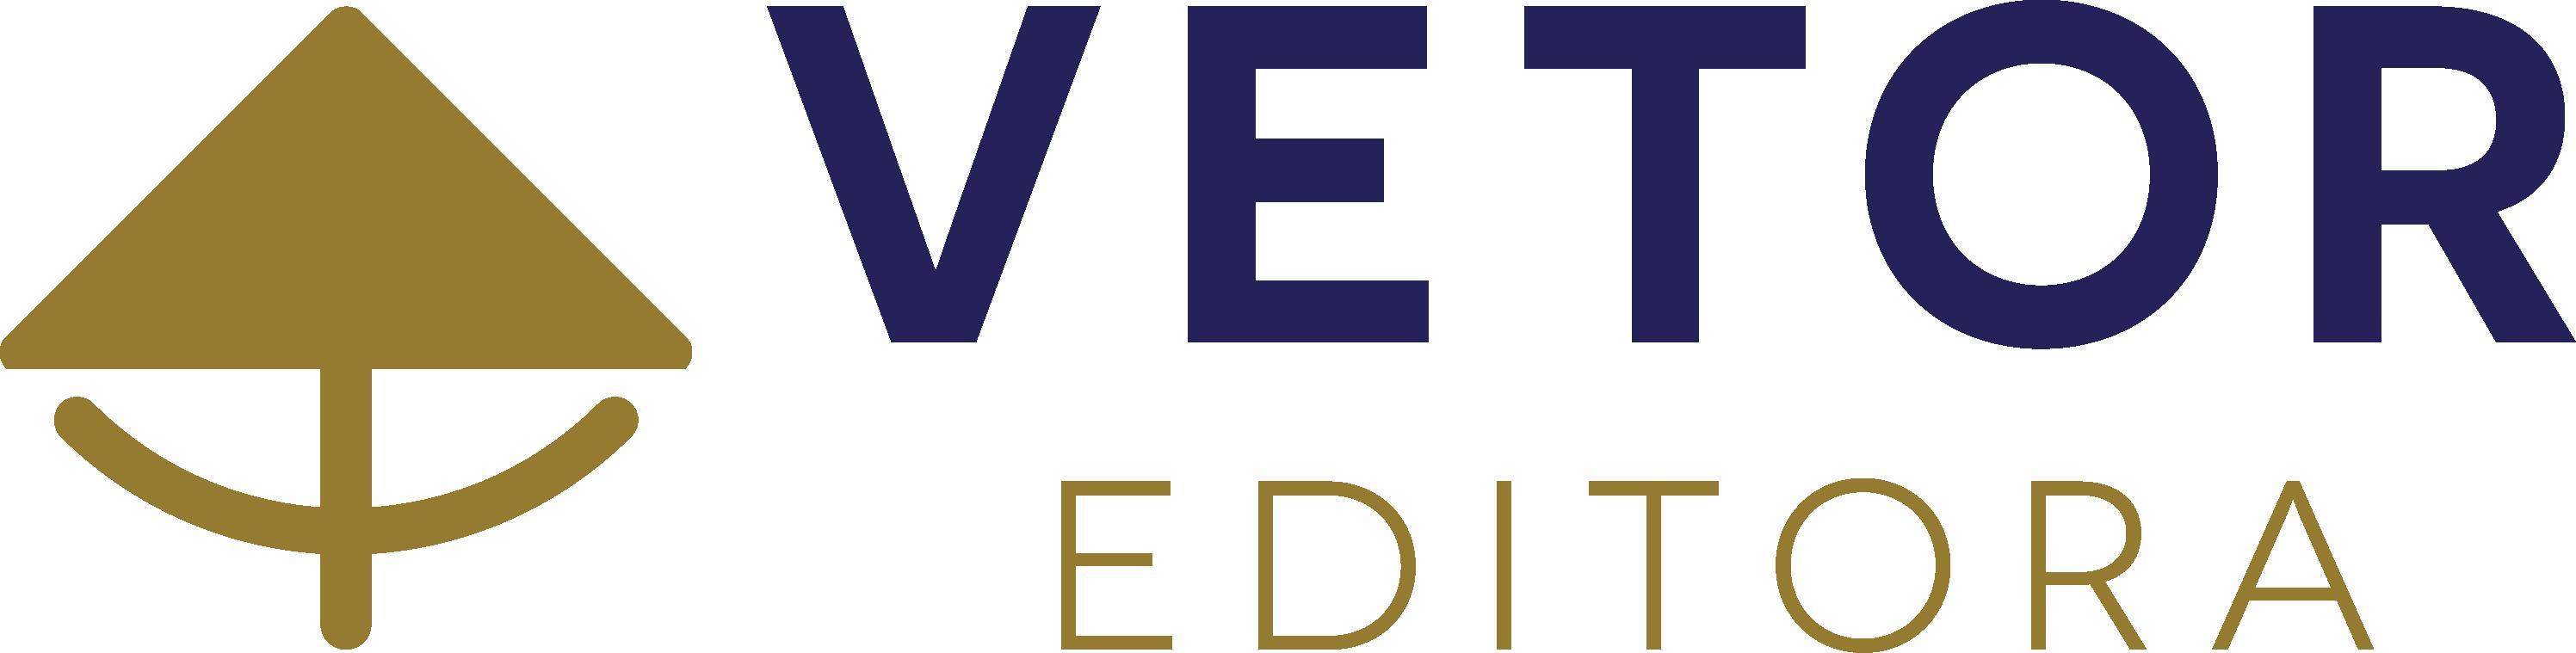 Vetor Editora